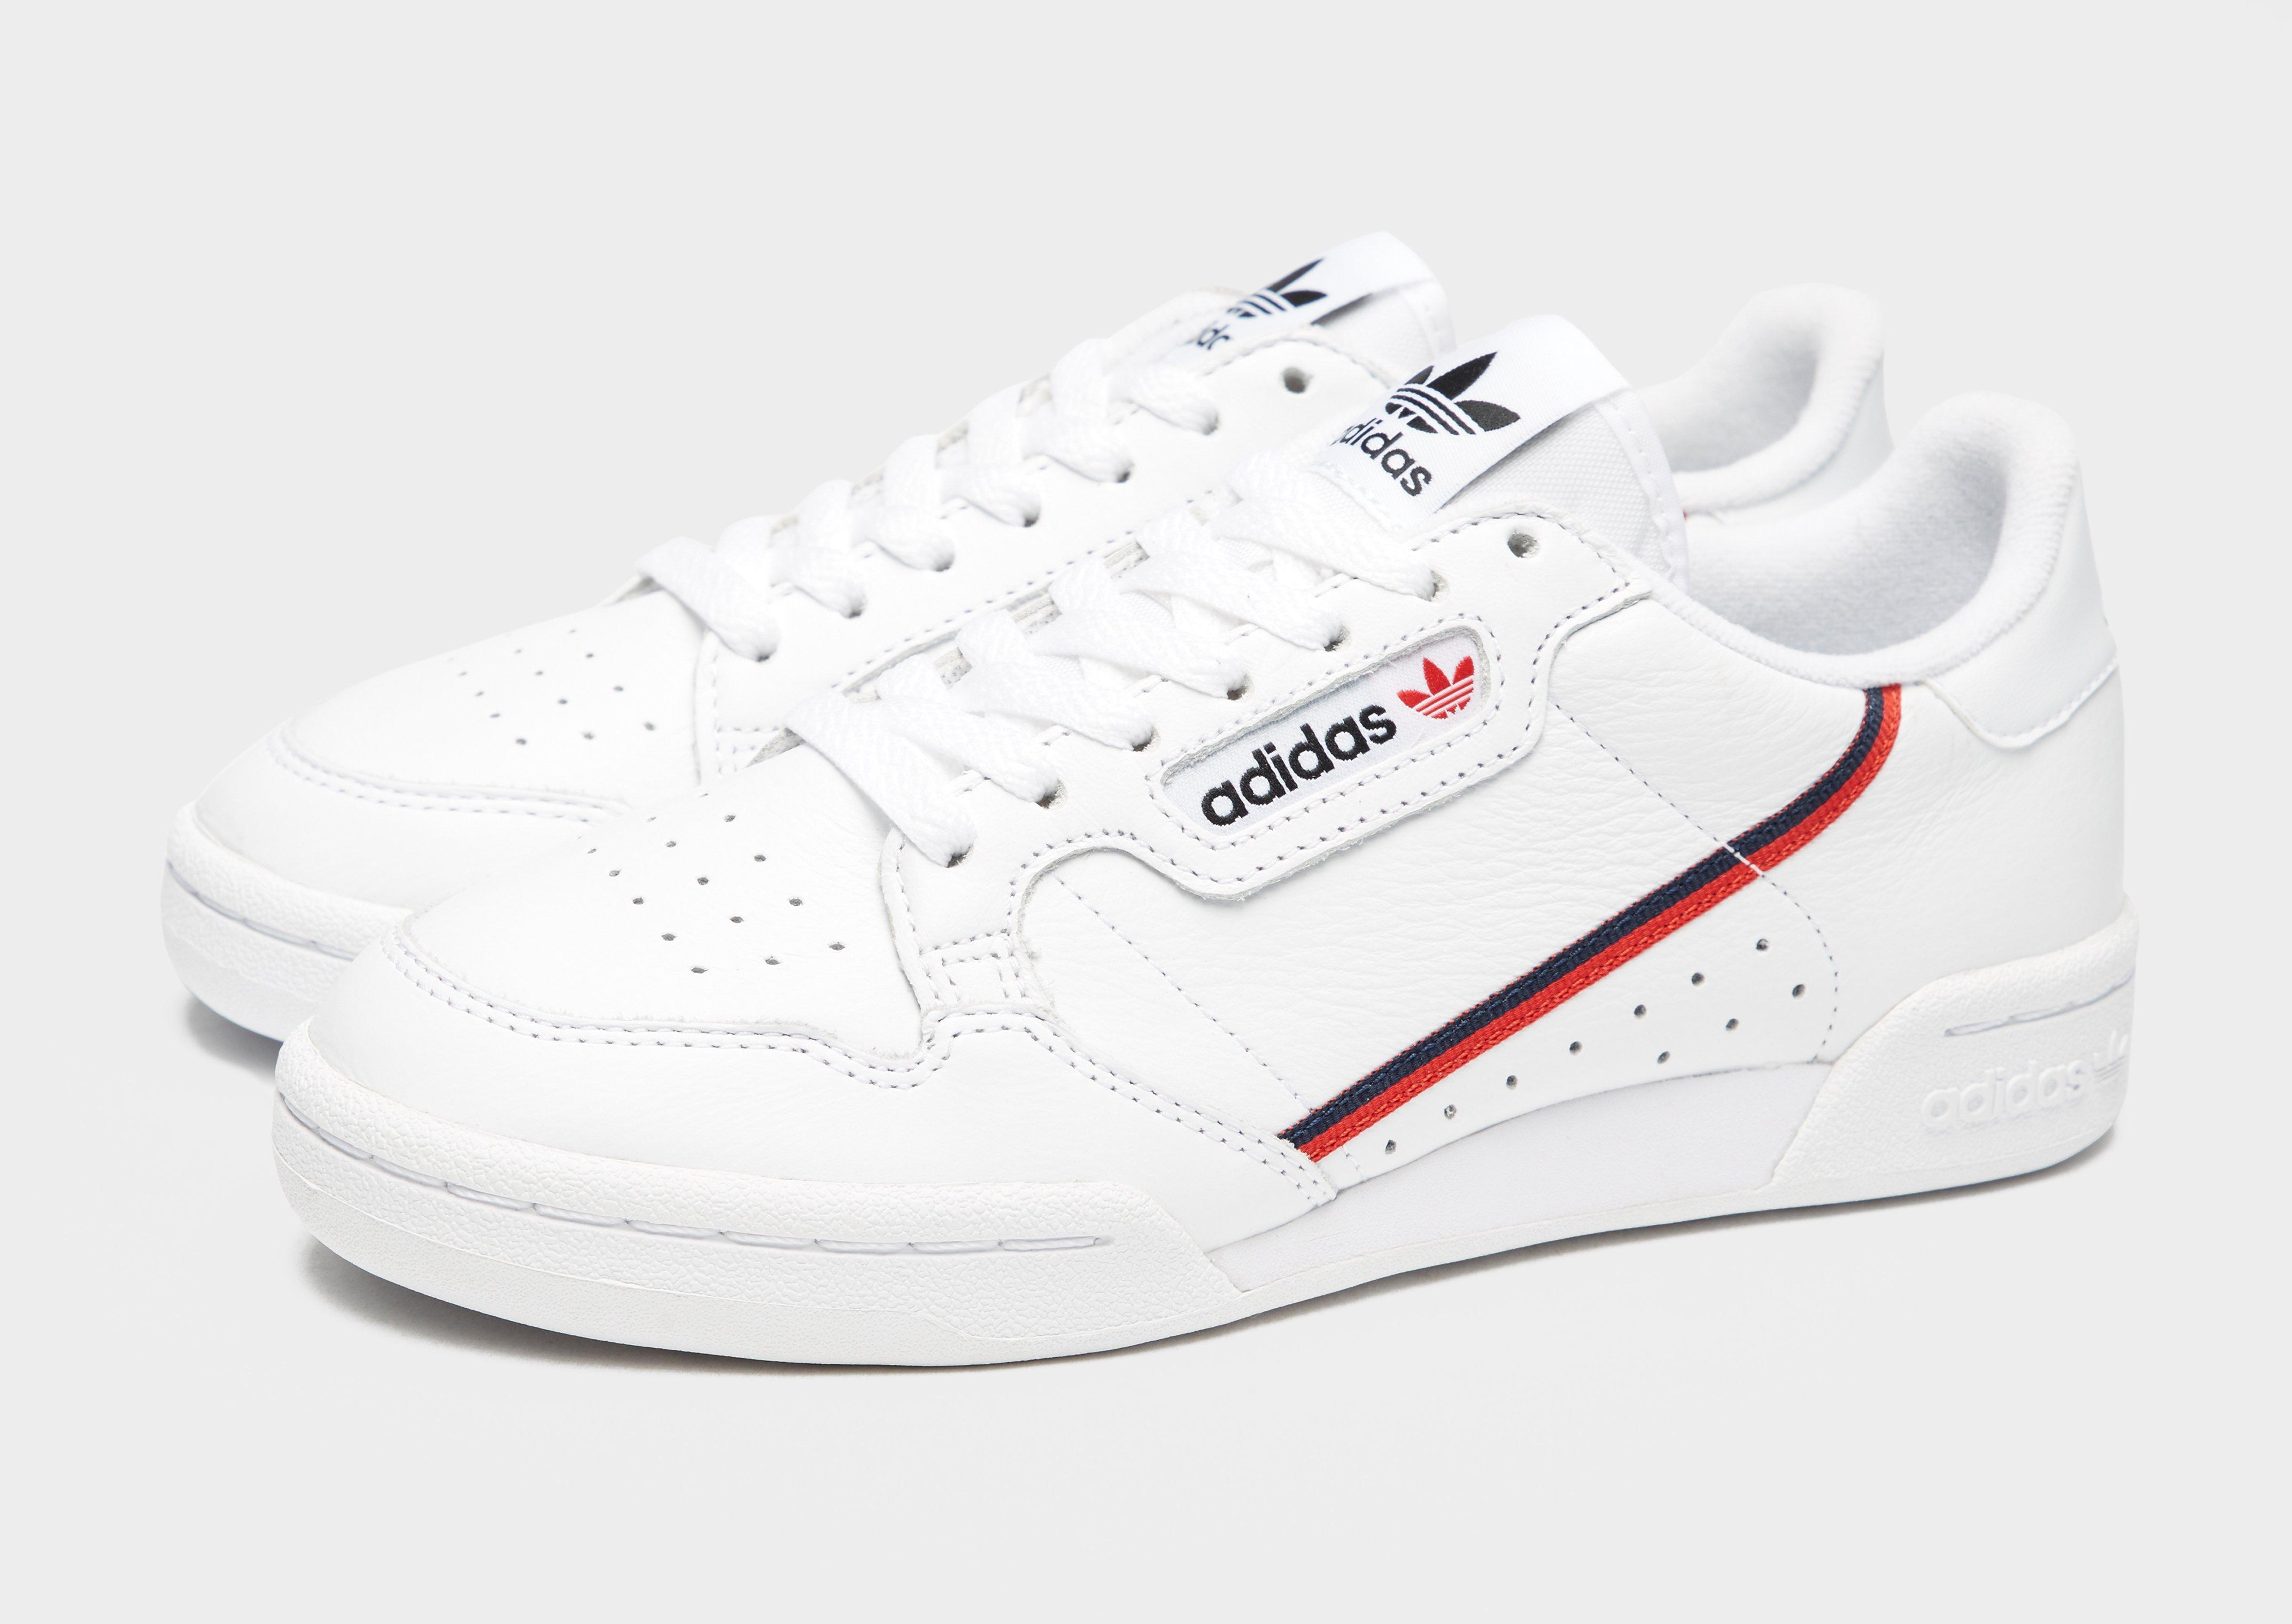 73a6d4b6917 adidas classic adidas classic  adidas classic adidas Originals Continental  80